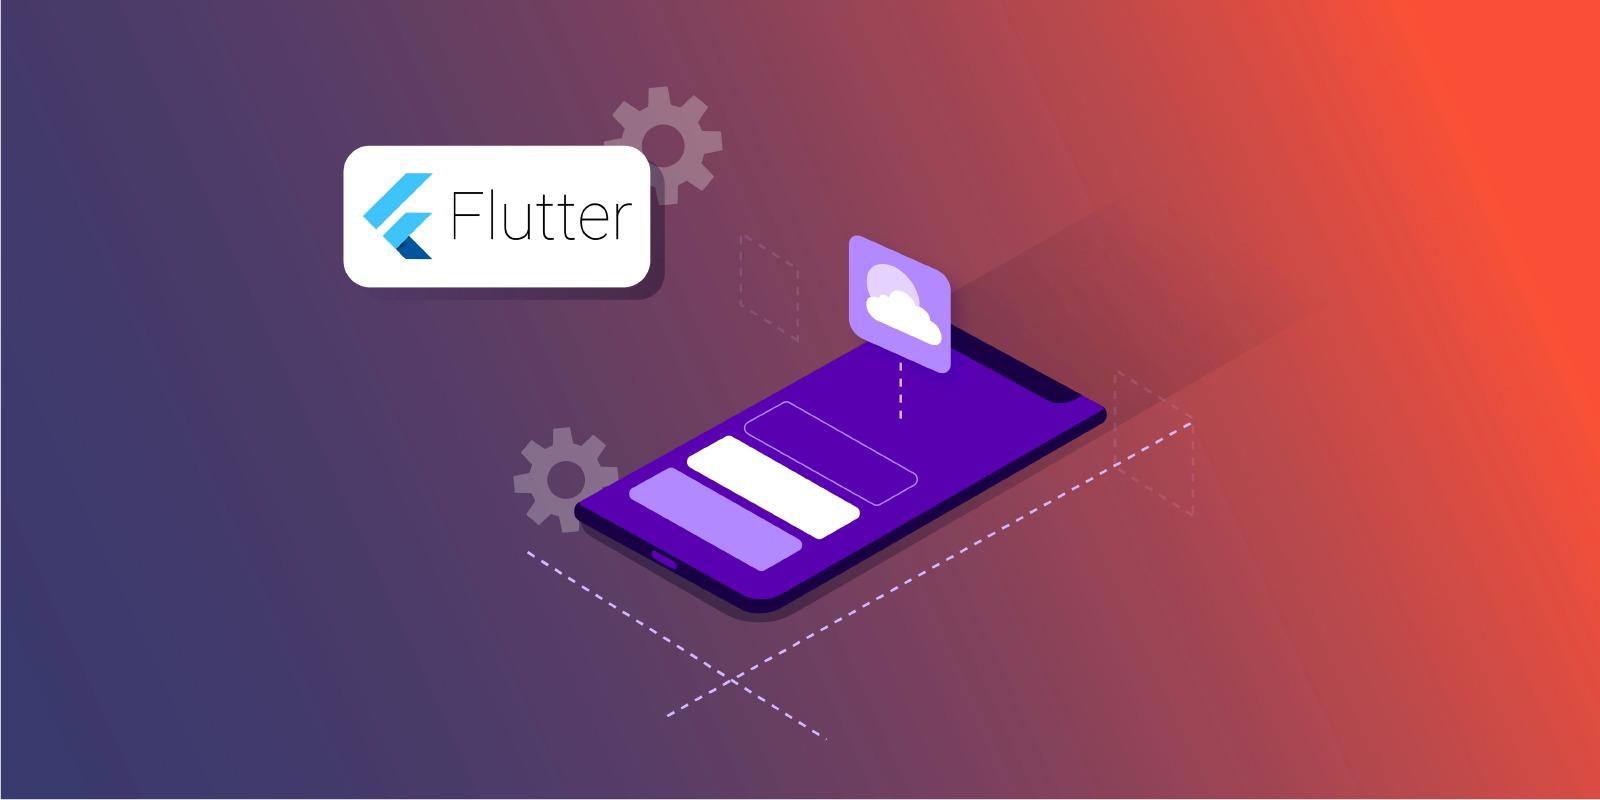 Why Flutter